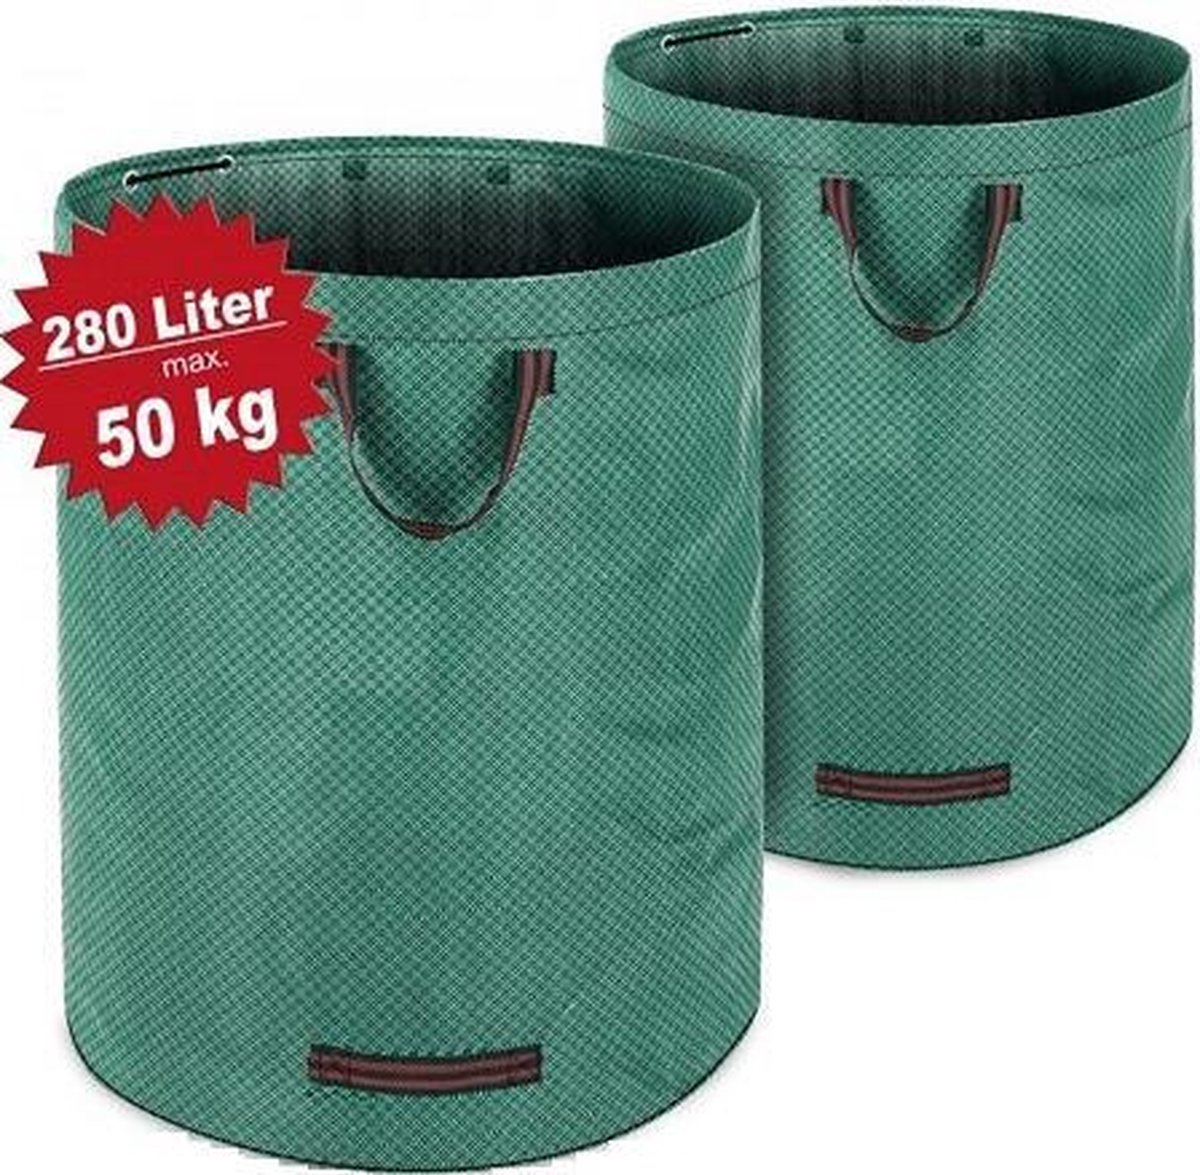 Tuin afvalzak - 2 stuks - 280 liter - 50 kg